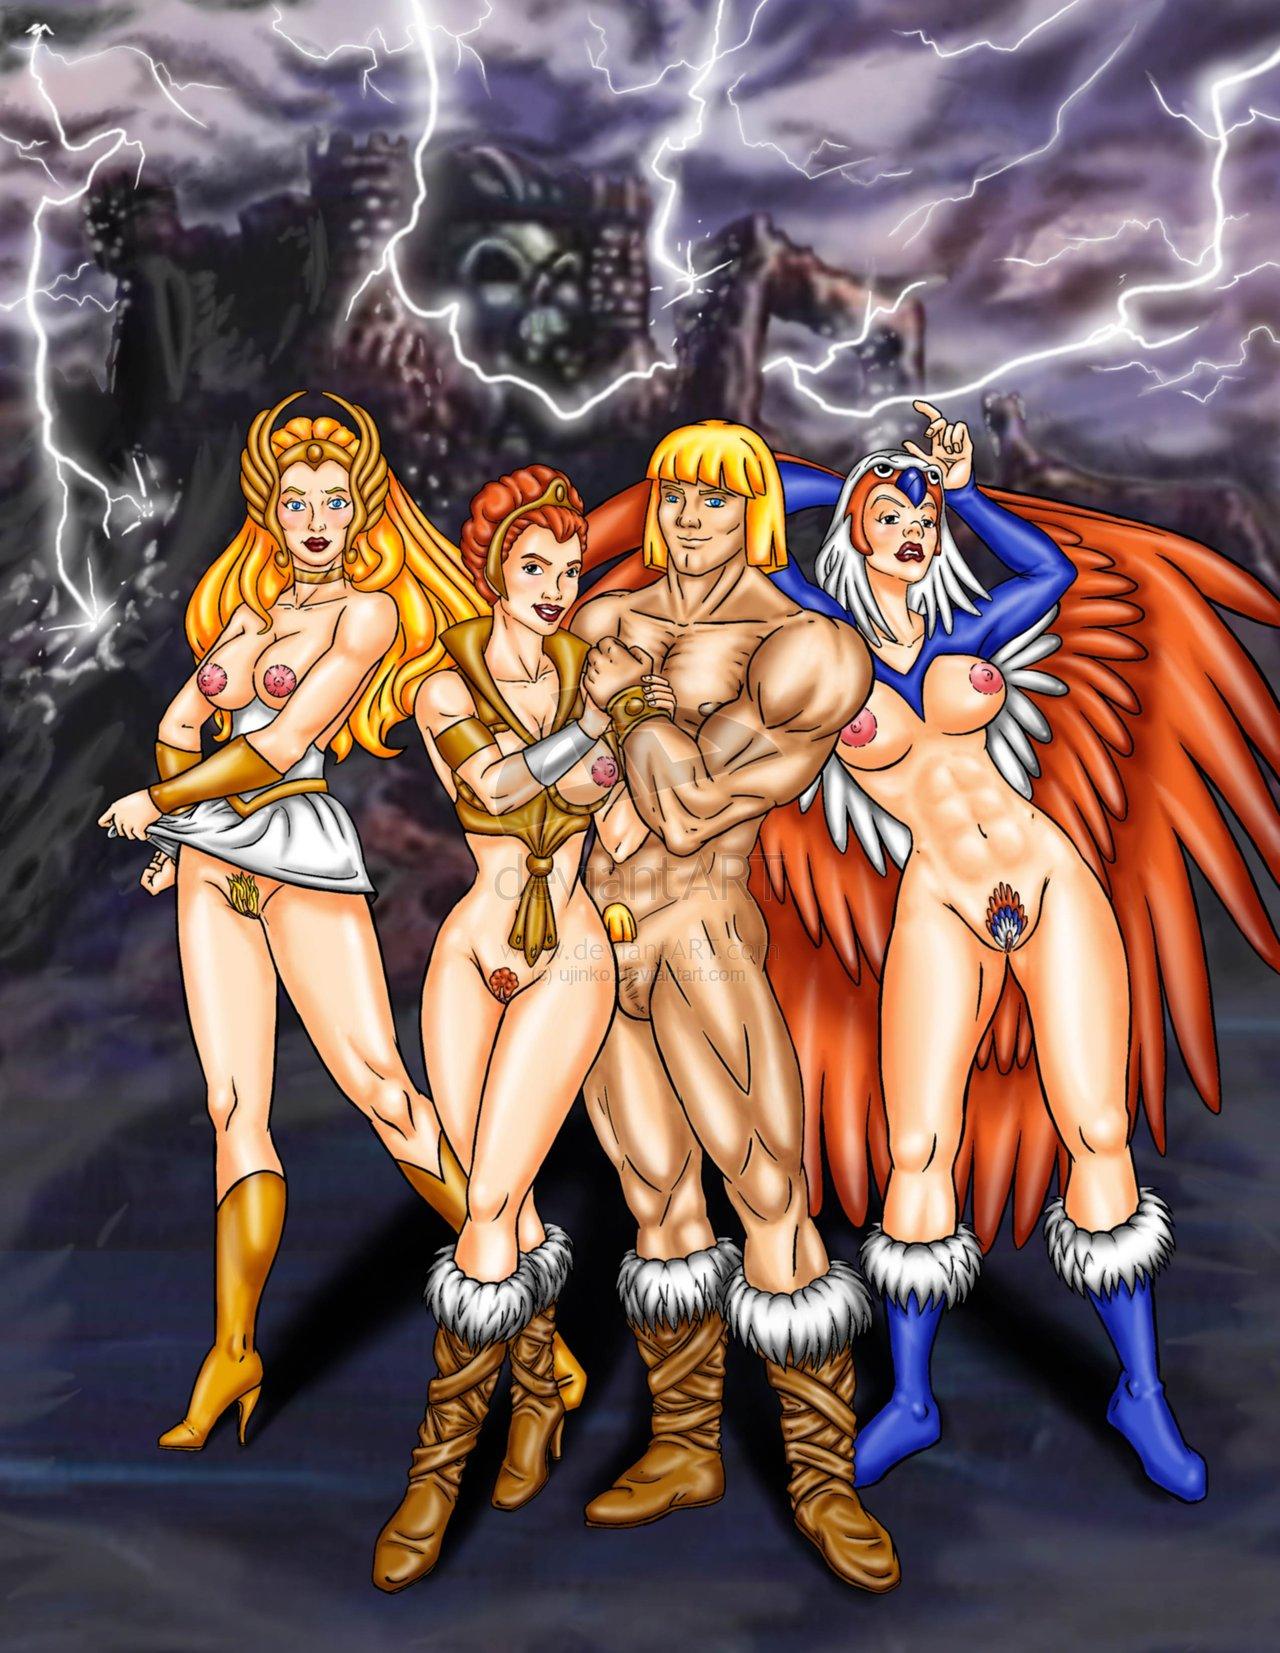 of gem amethyst world - princess Wonder woman x power girl